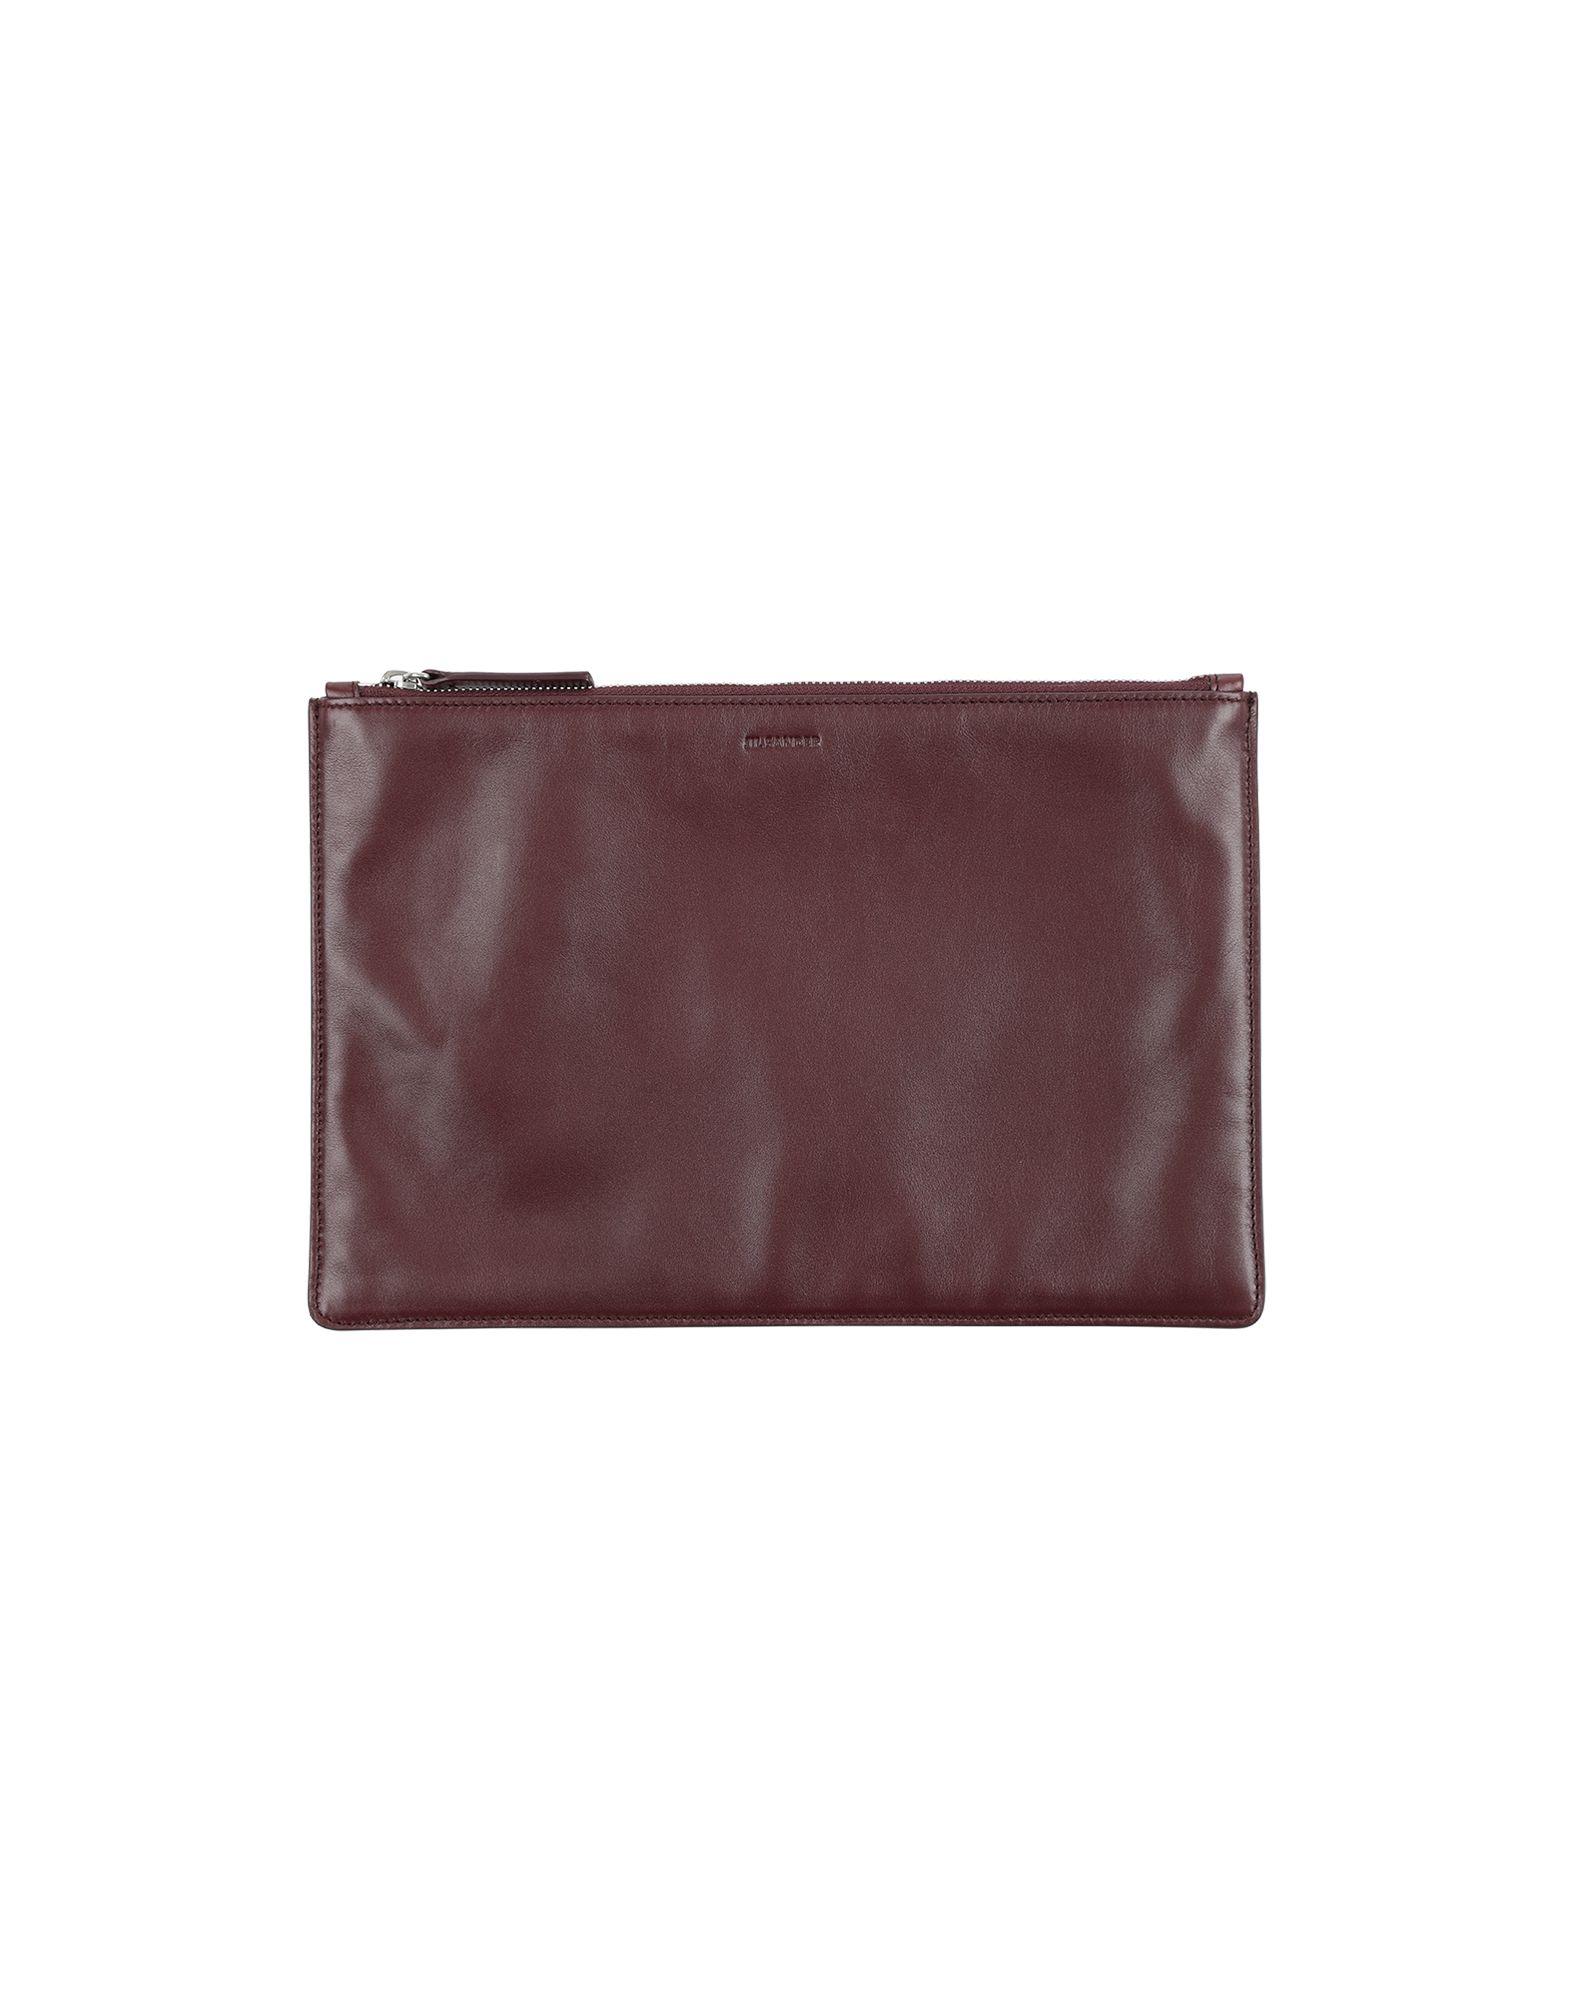 JIL SANDER Pouches. leather, logo, solid color, contains non-textile parts of animal origin. Calfskin